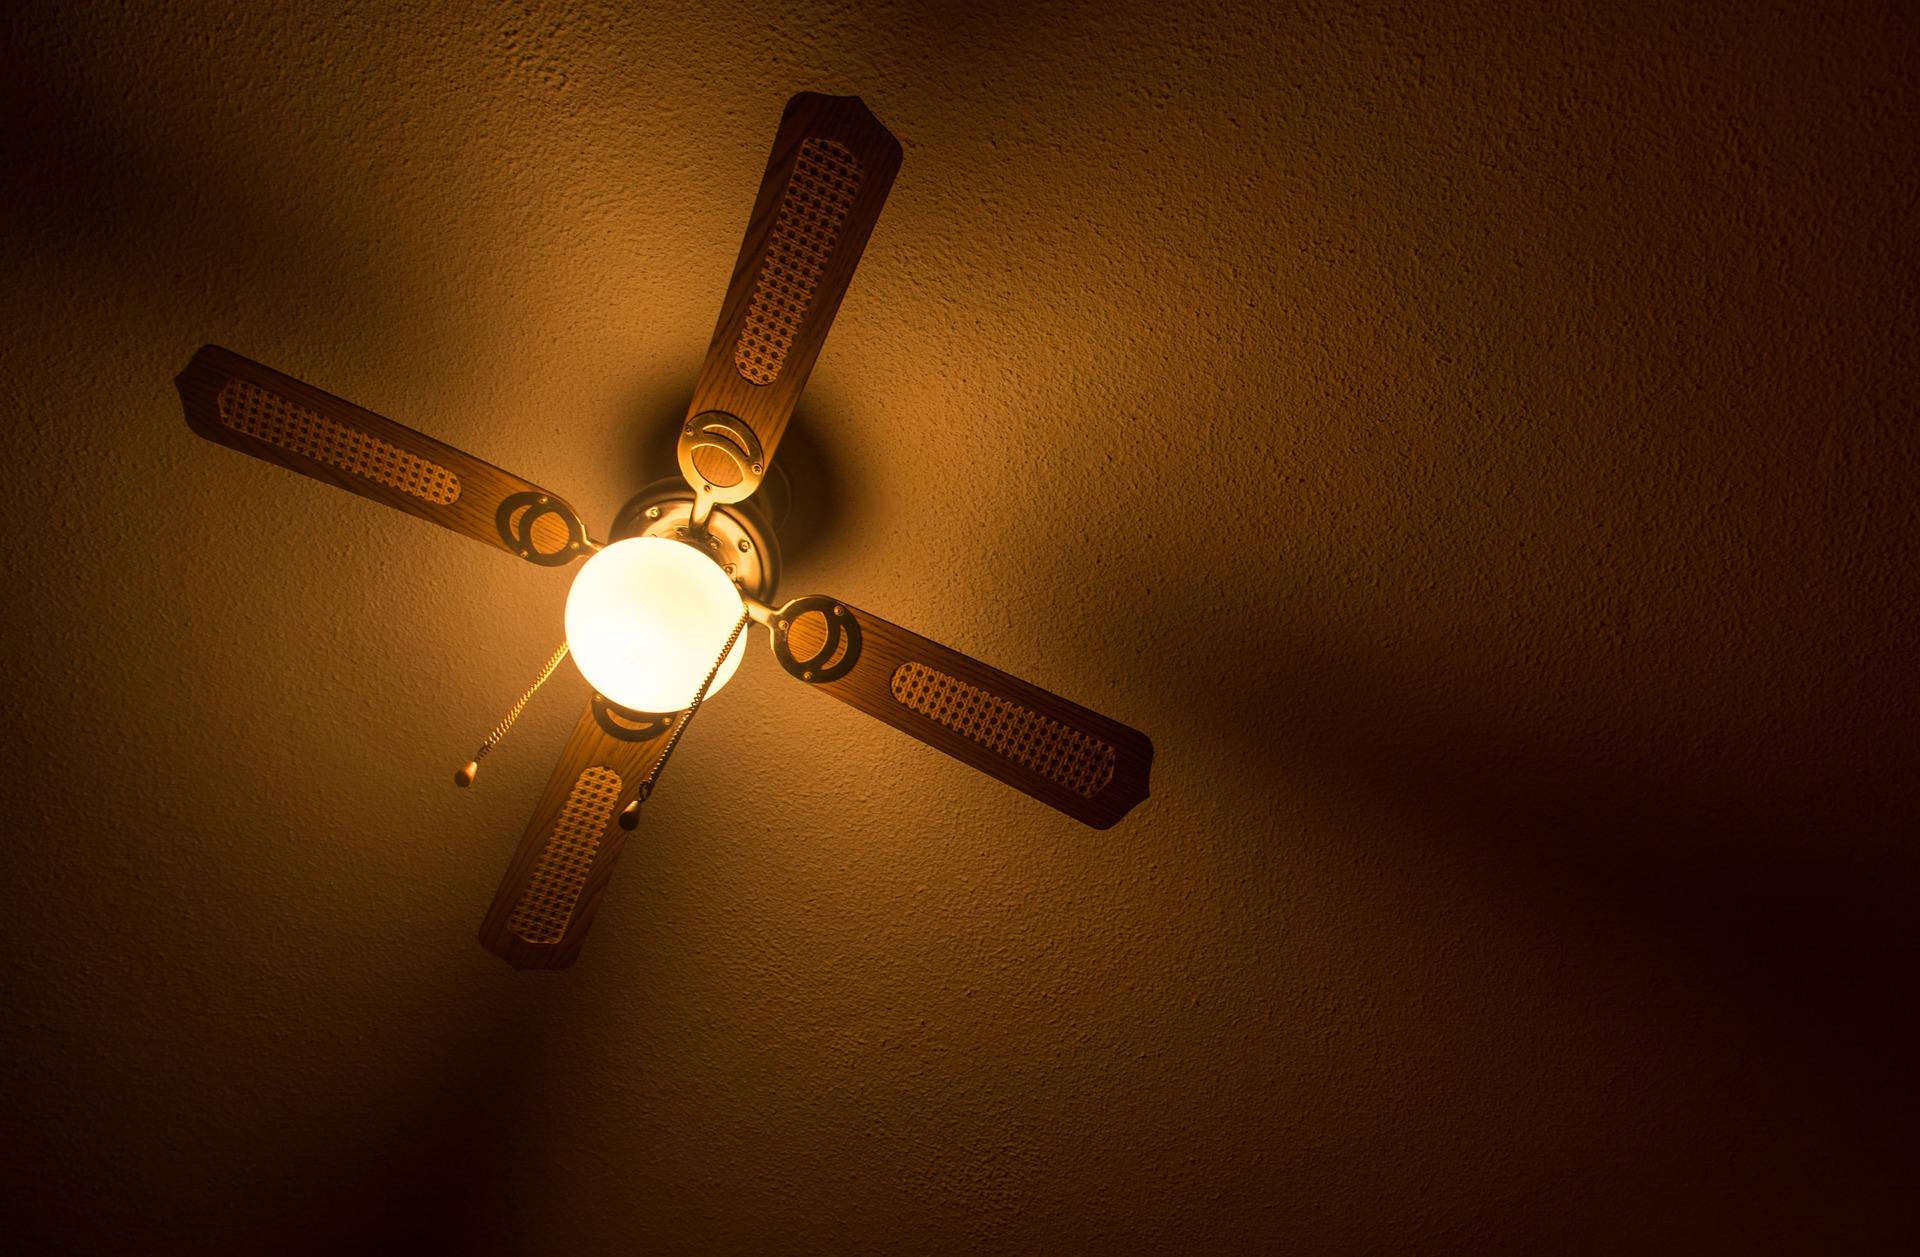 พัดลม ติดเพดาน